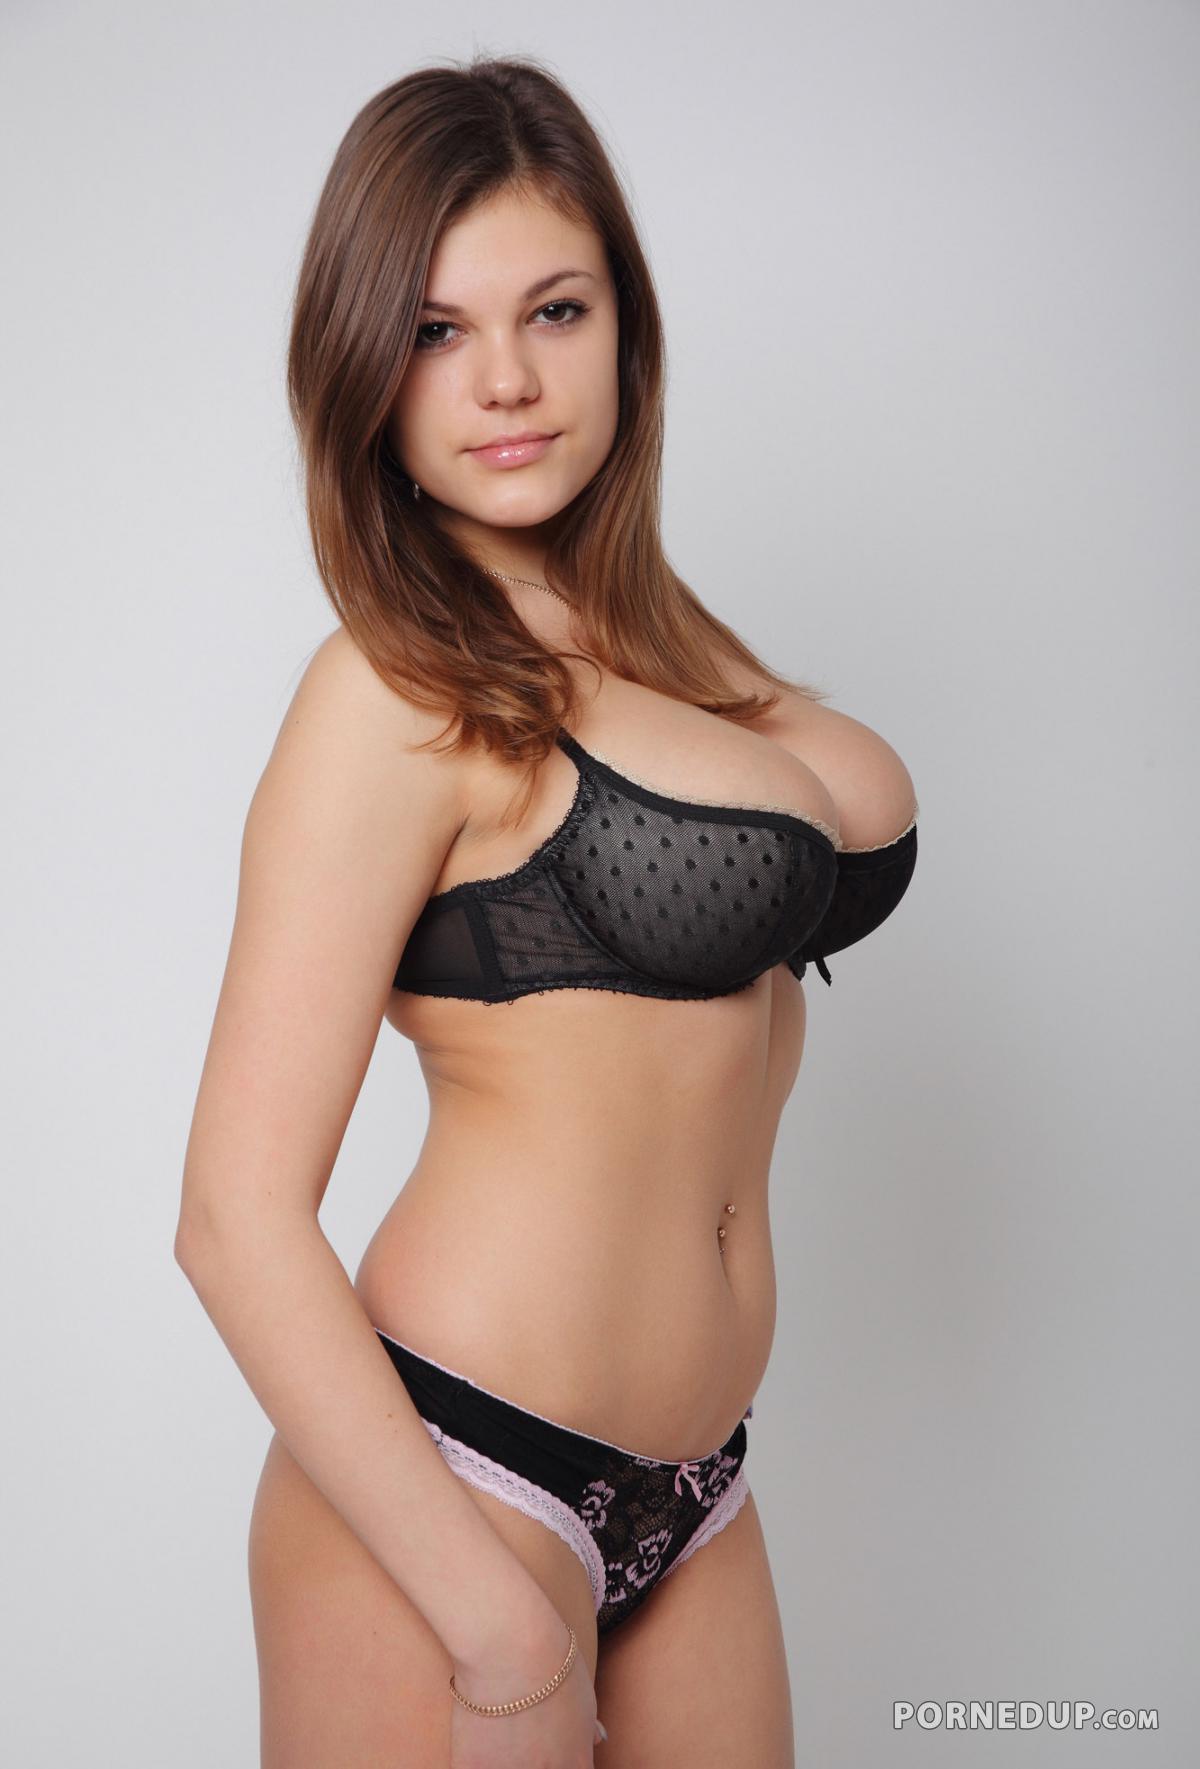 Big boobs in bras